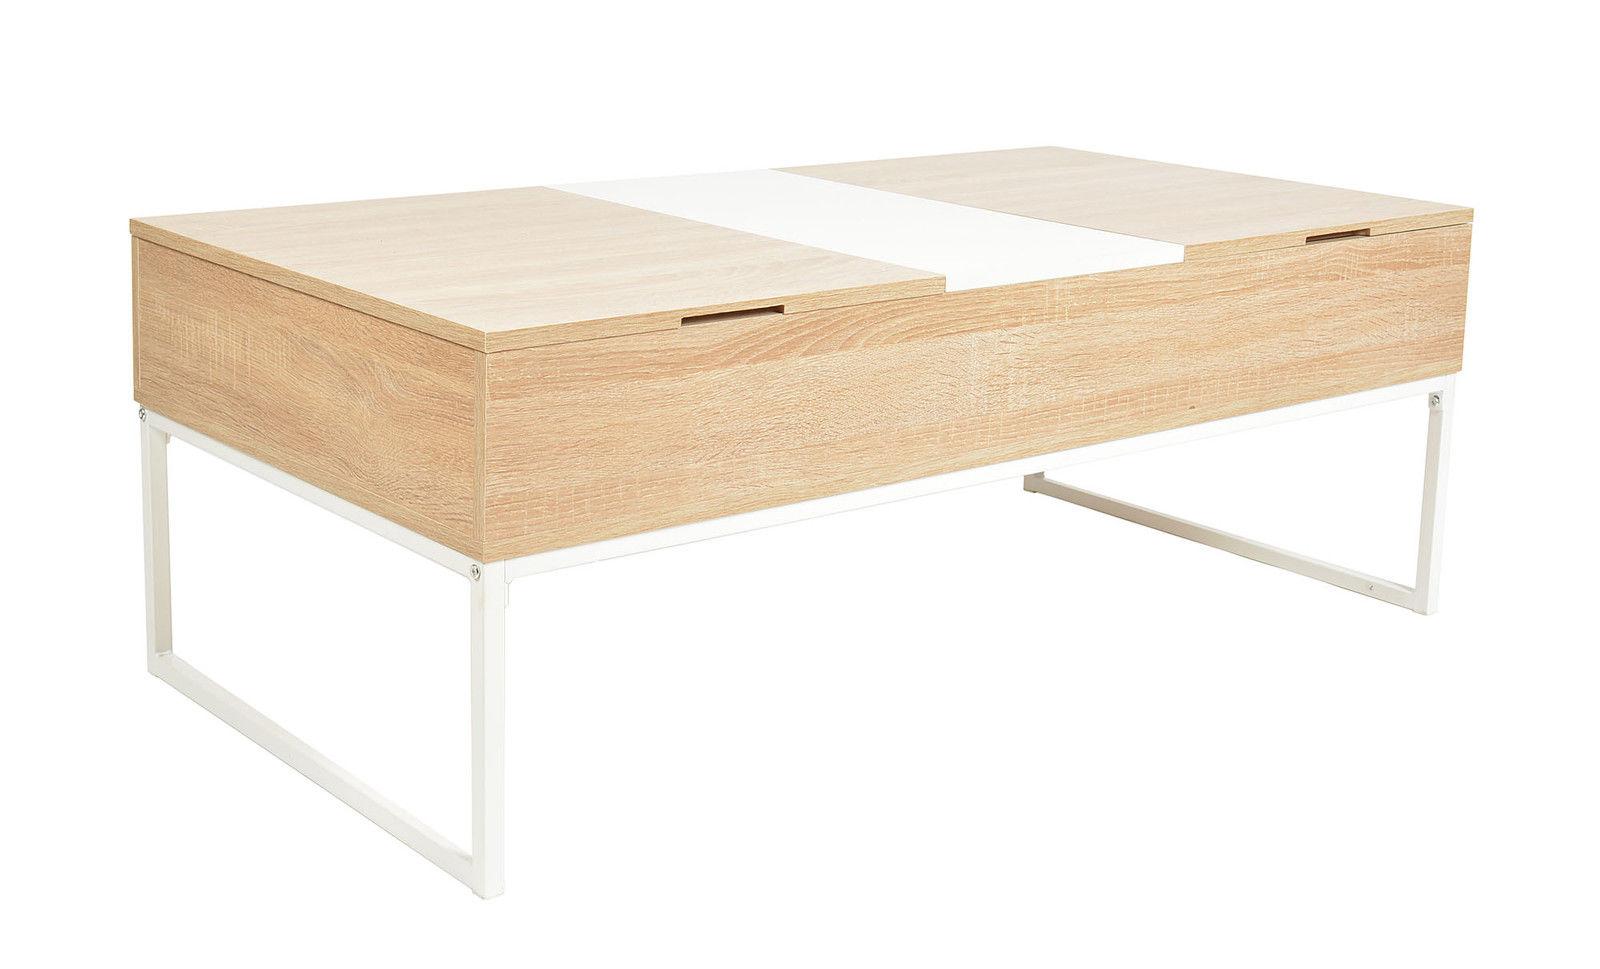 Table basse scandinave escamotable